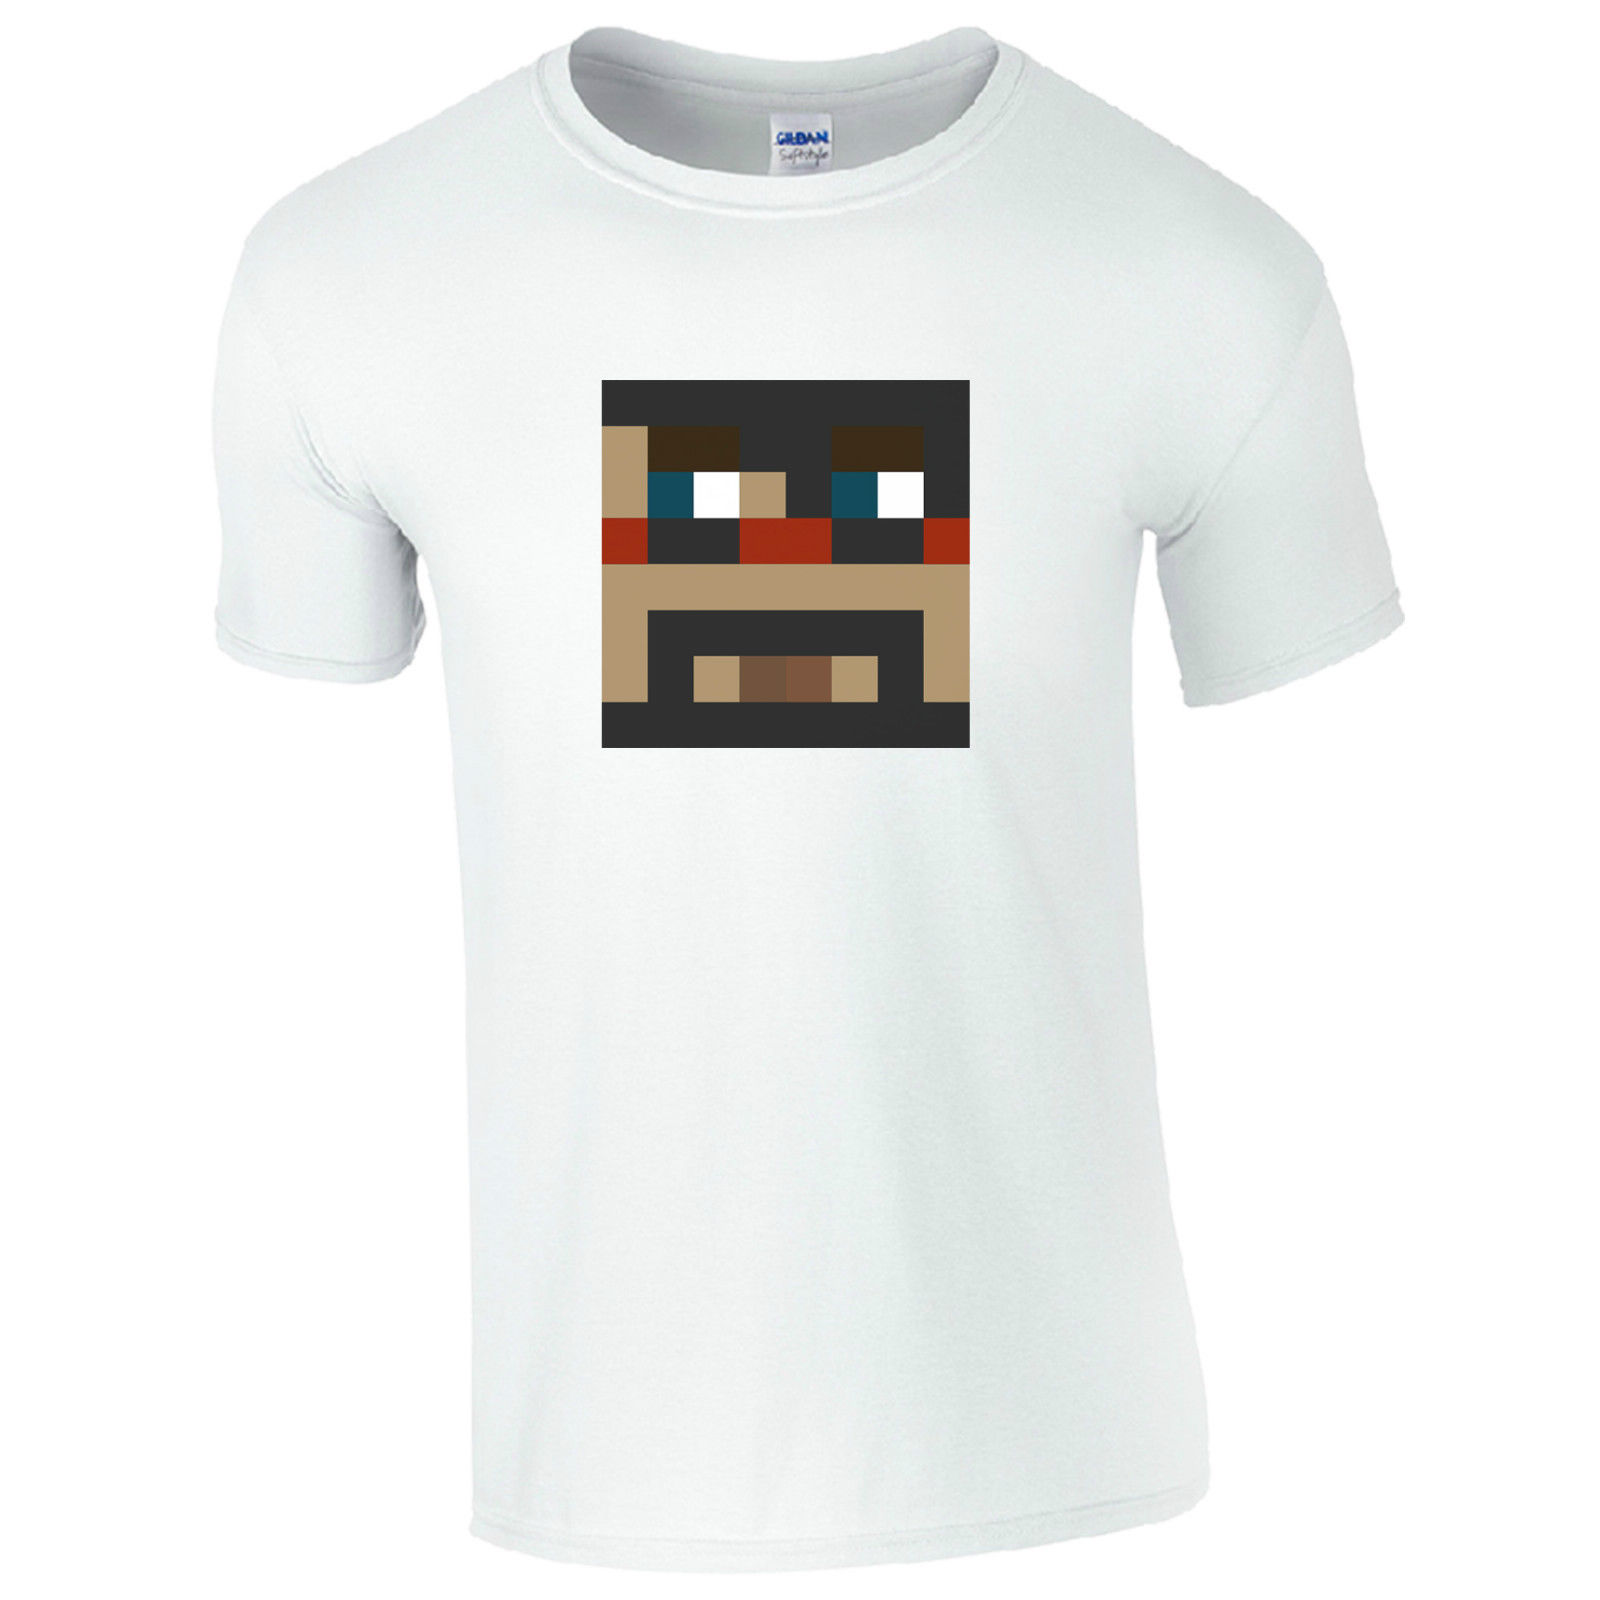 T shirt design youtube - Captainsparklez T Shirt Fun Cool Cs Youtube Video Gamer Fan Kids Men Gift Top